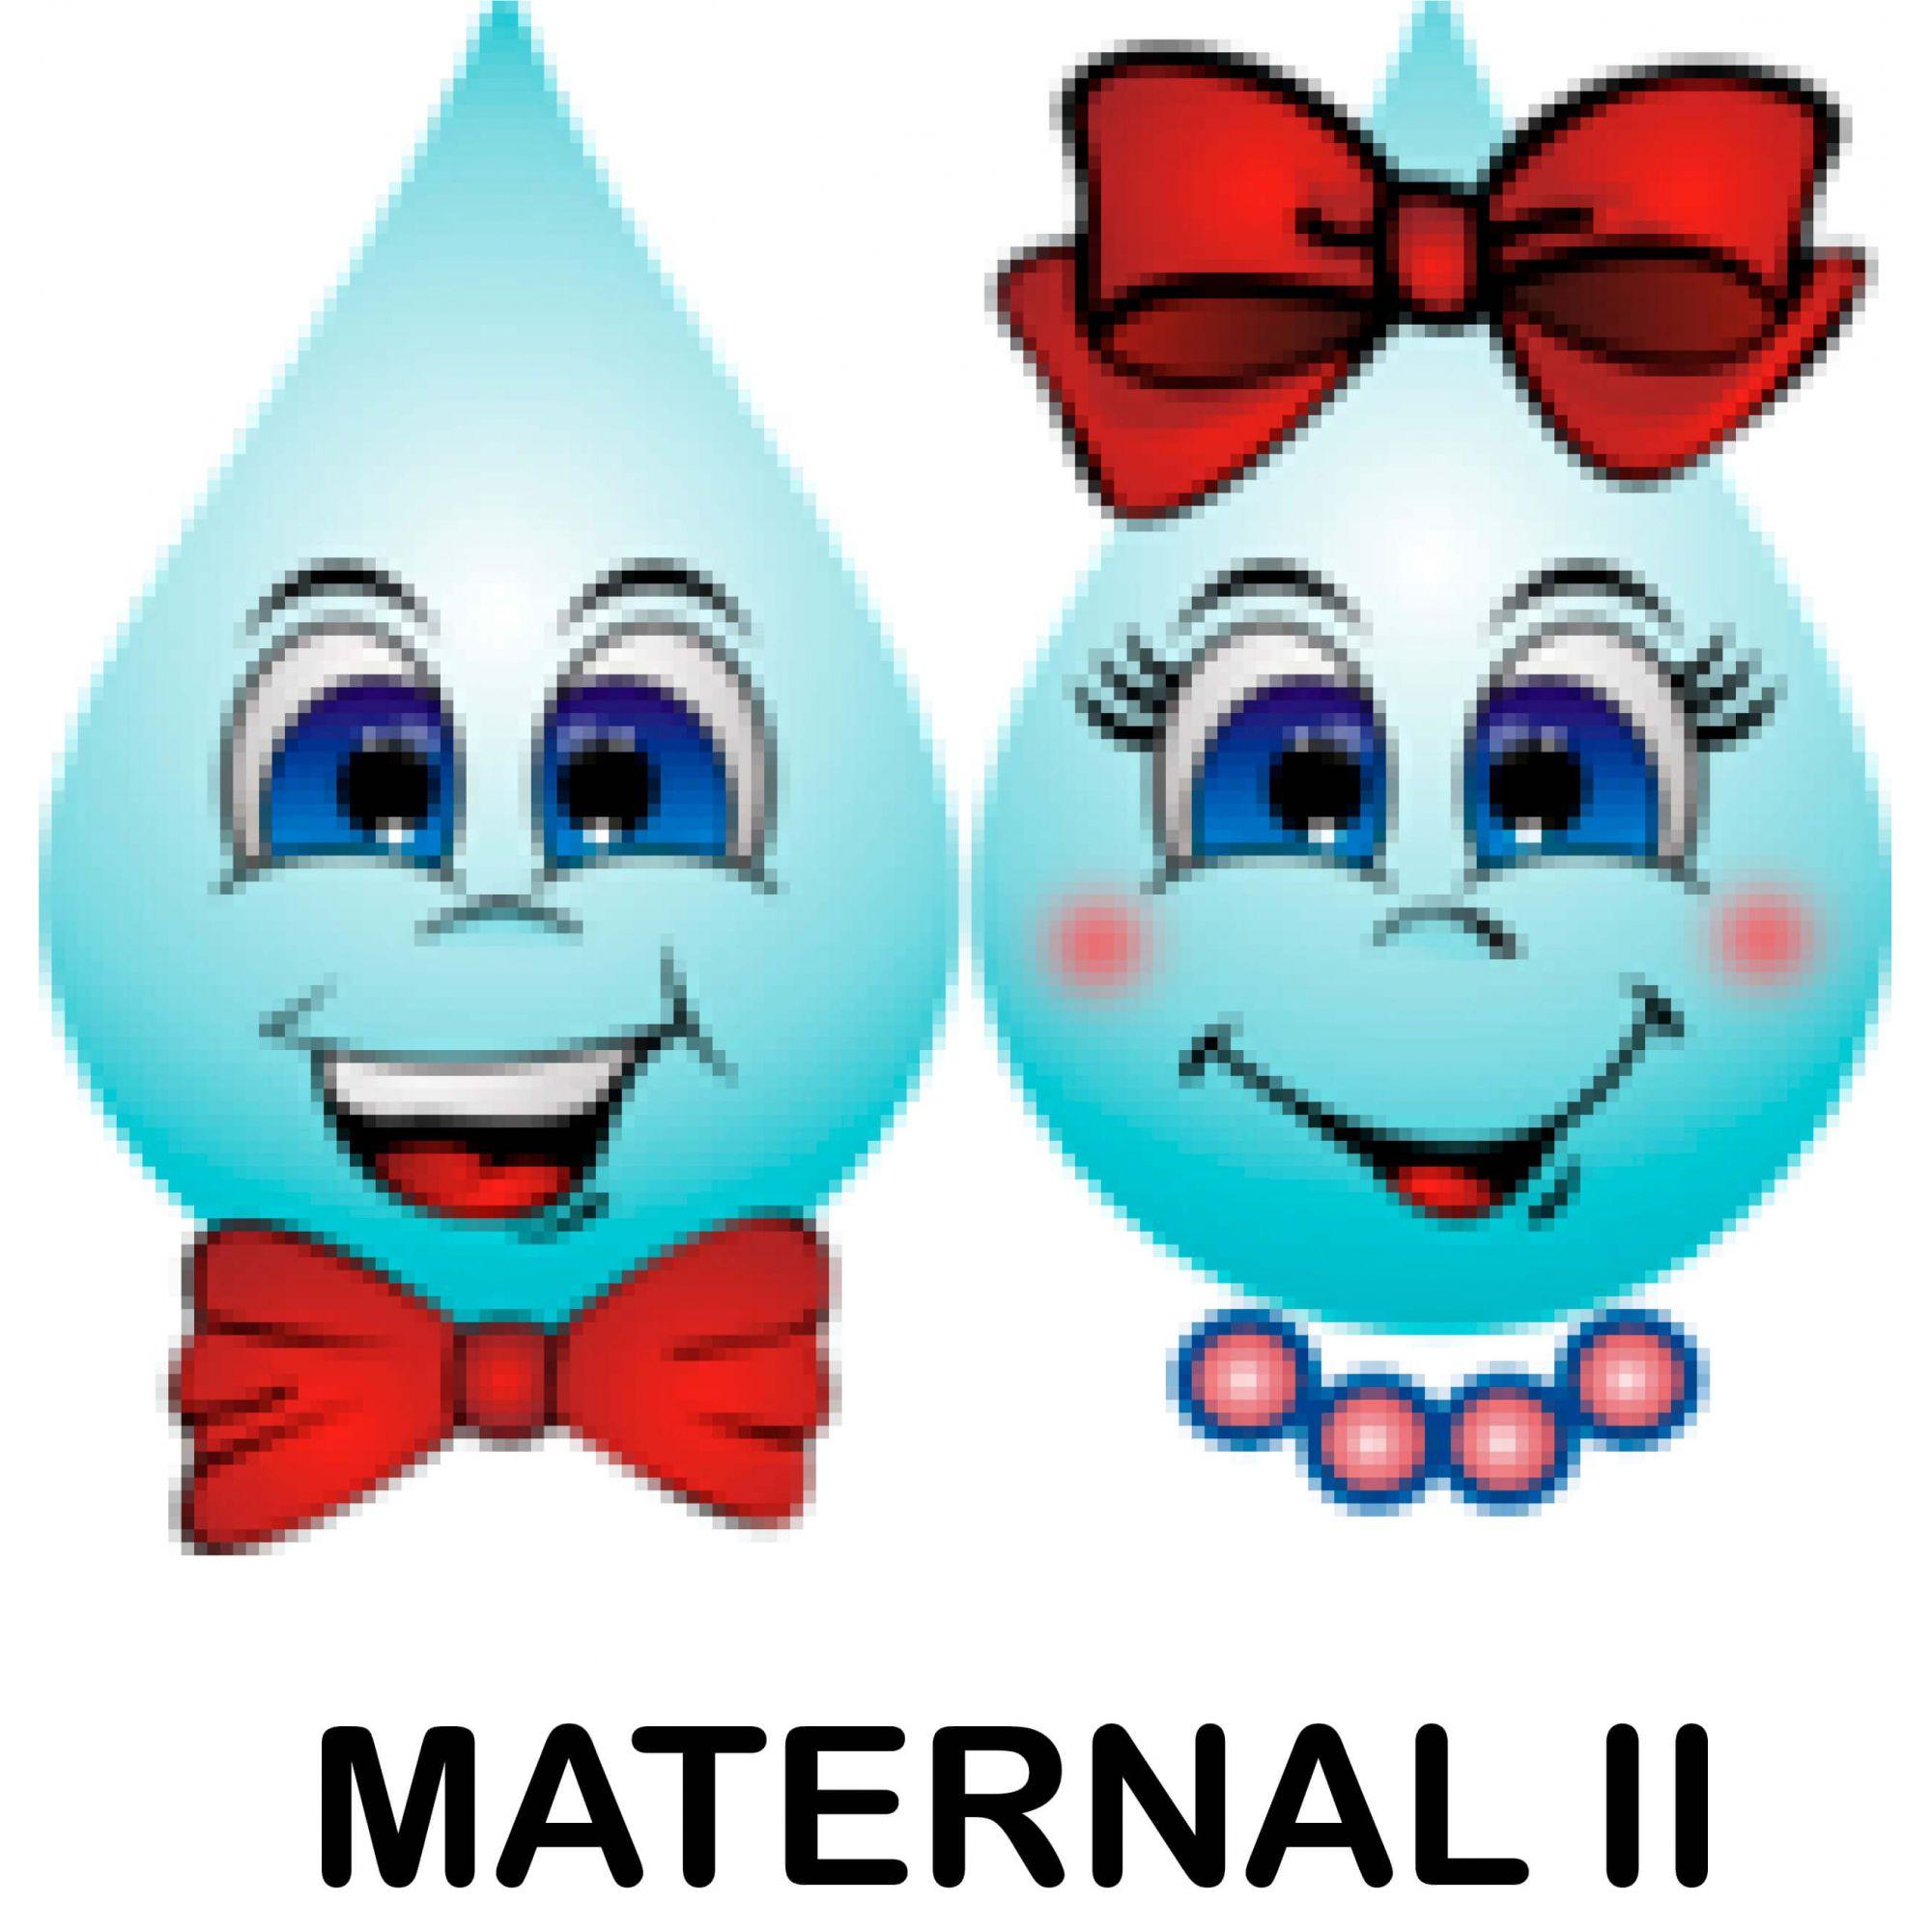 Pingo de Gente - Maternal II